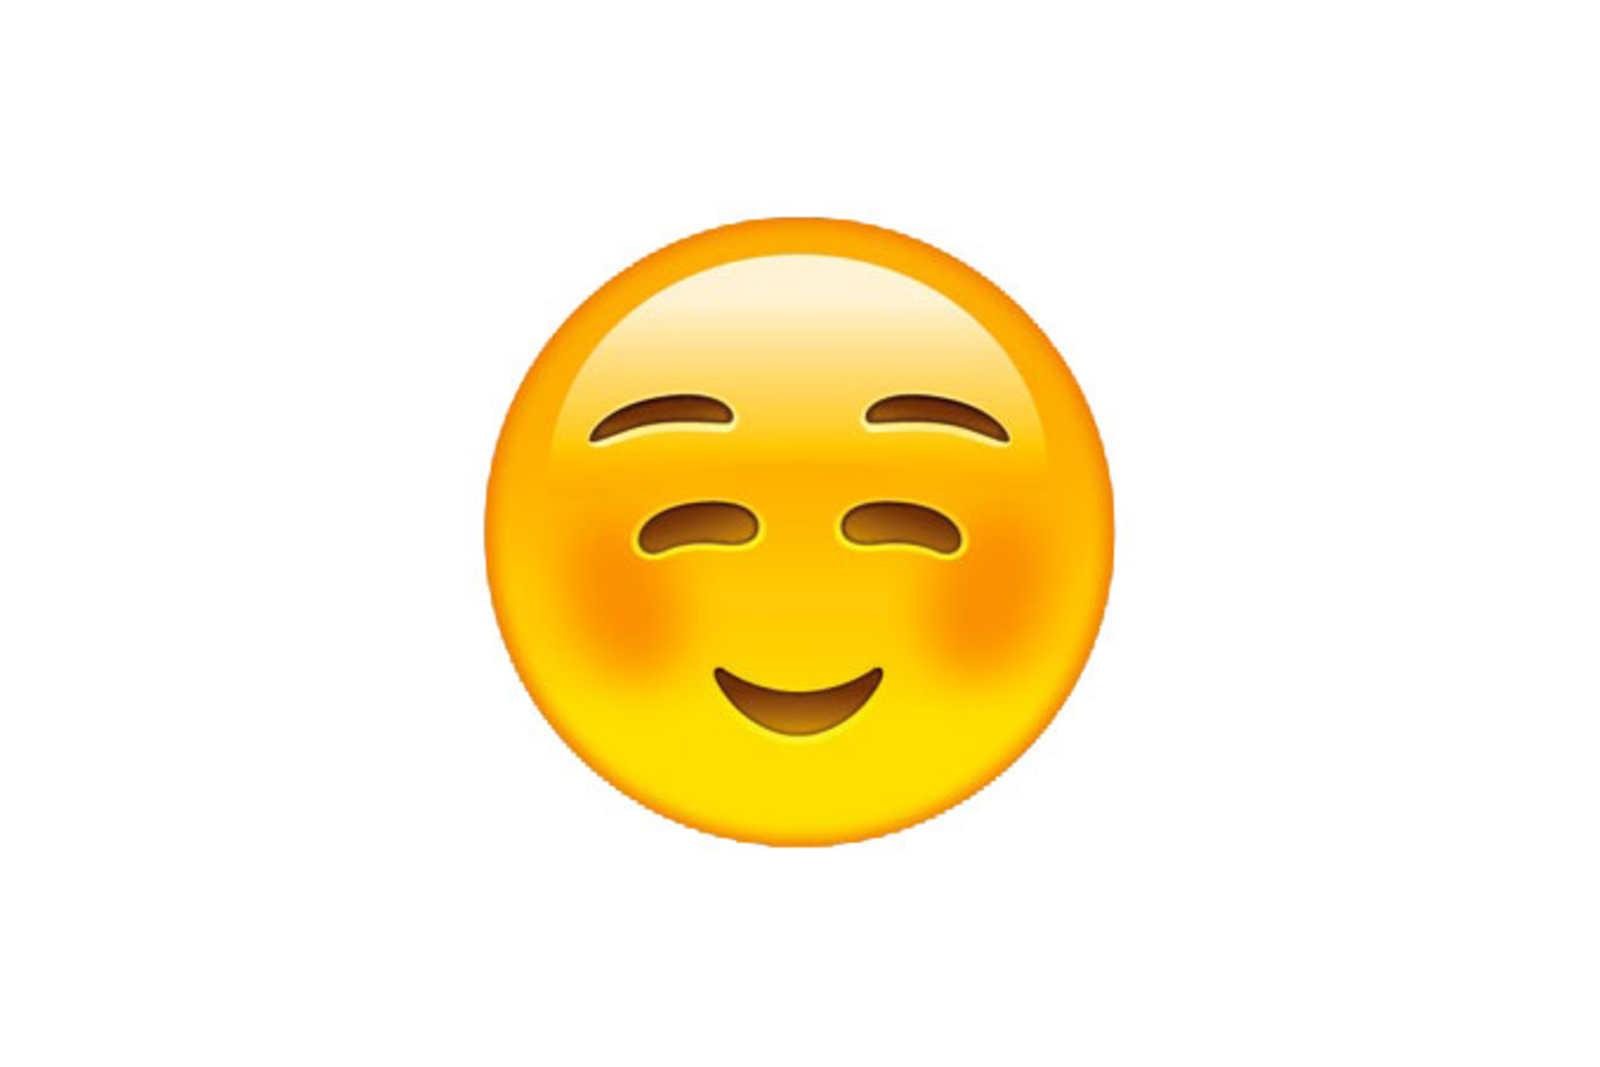 herz smileys whatsapp